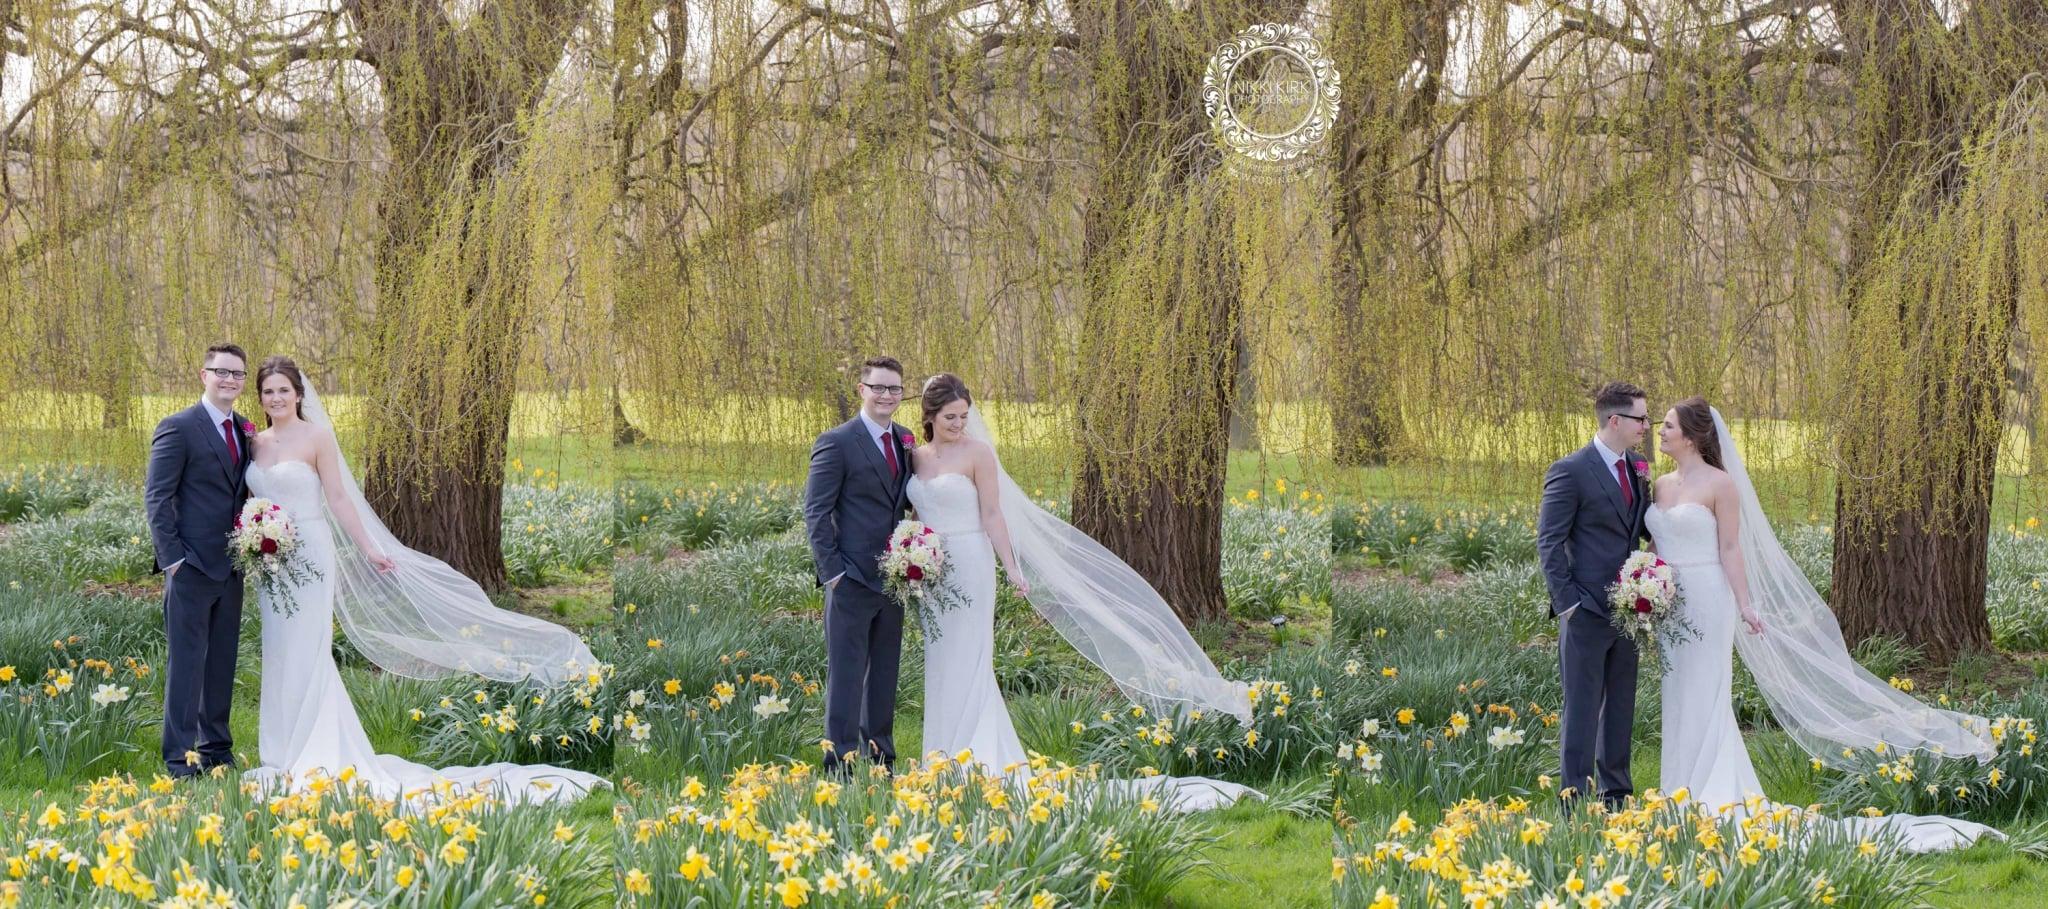 Glenfall-House-wedding-photographer-Nikki-Kirk-Photography